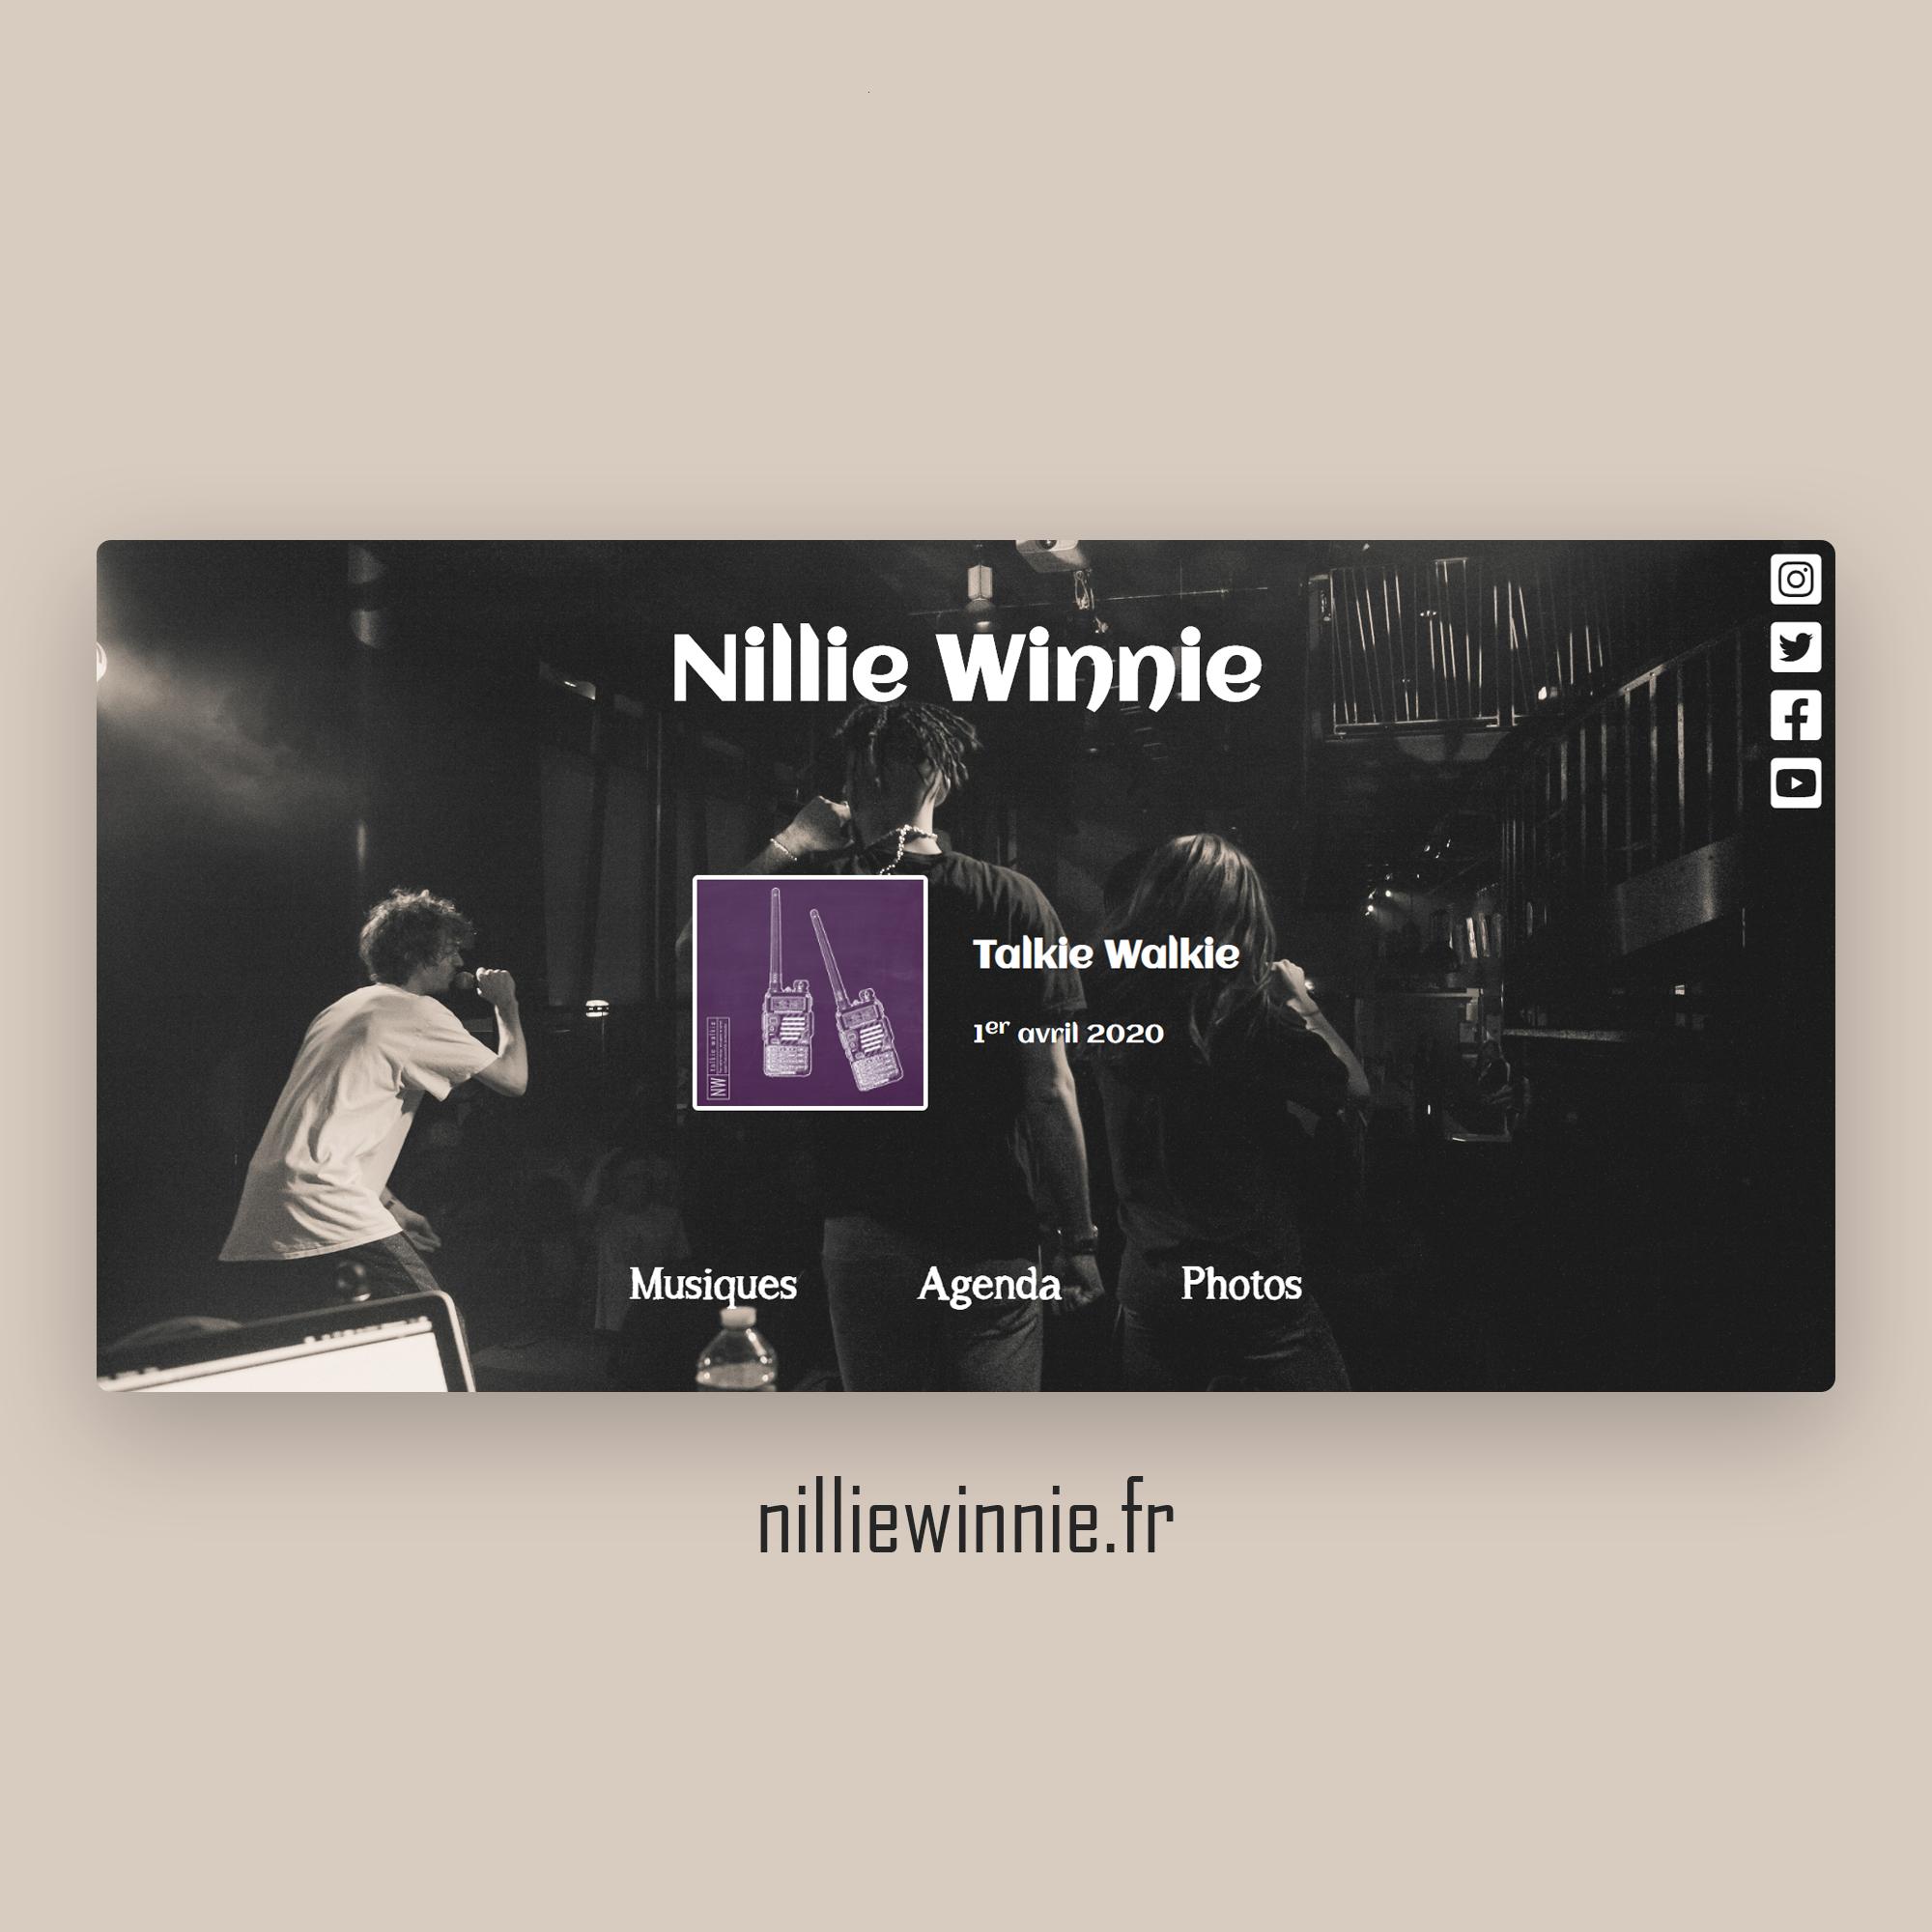 Nillie Winnie